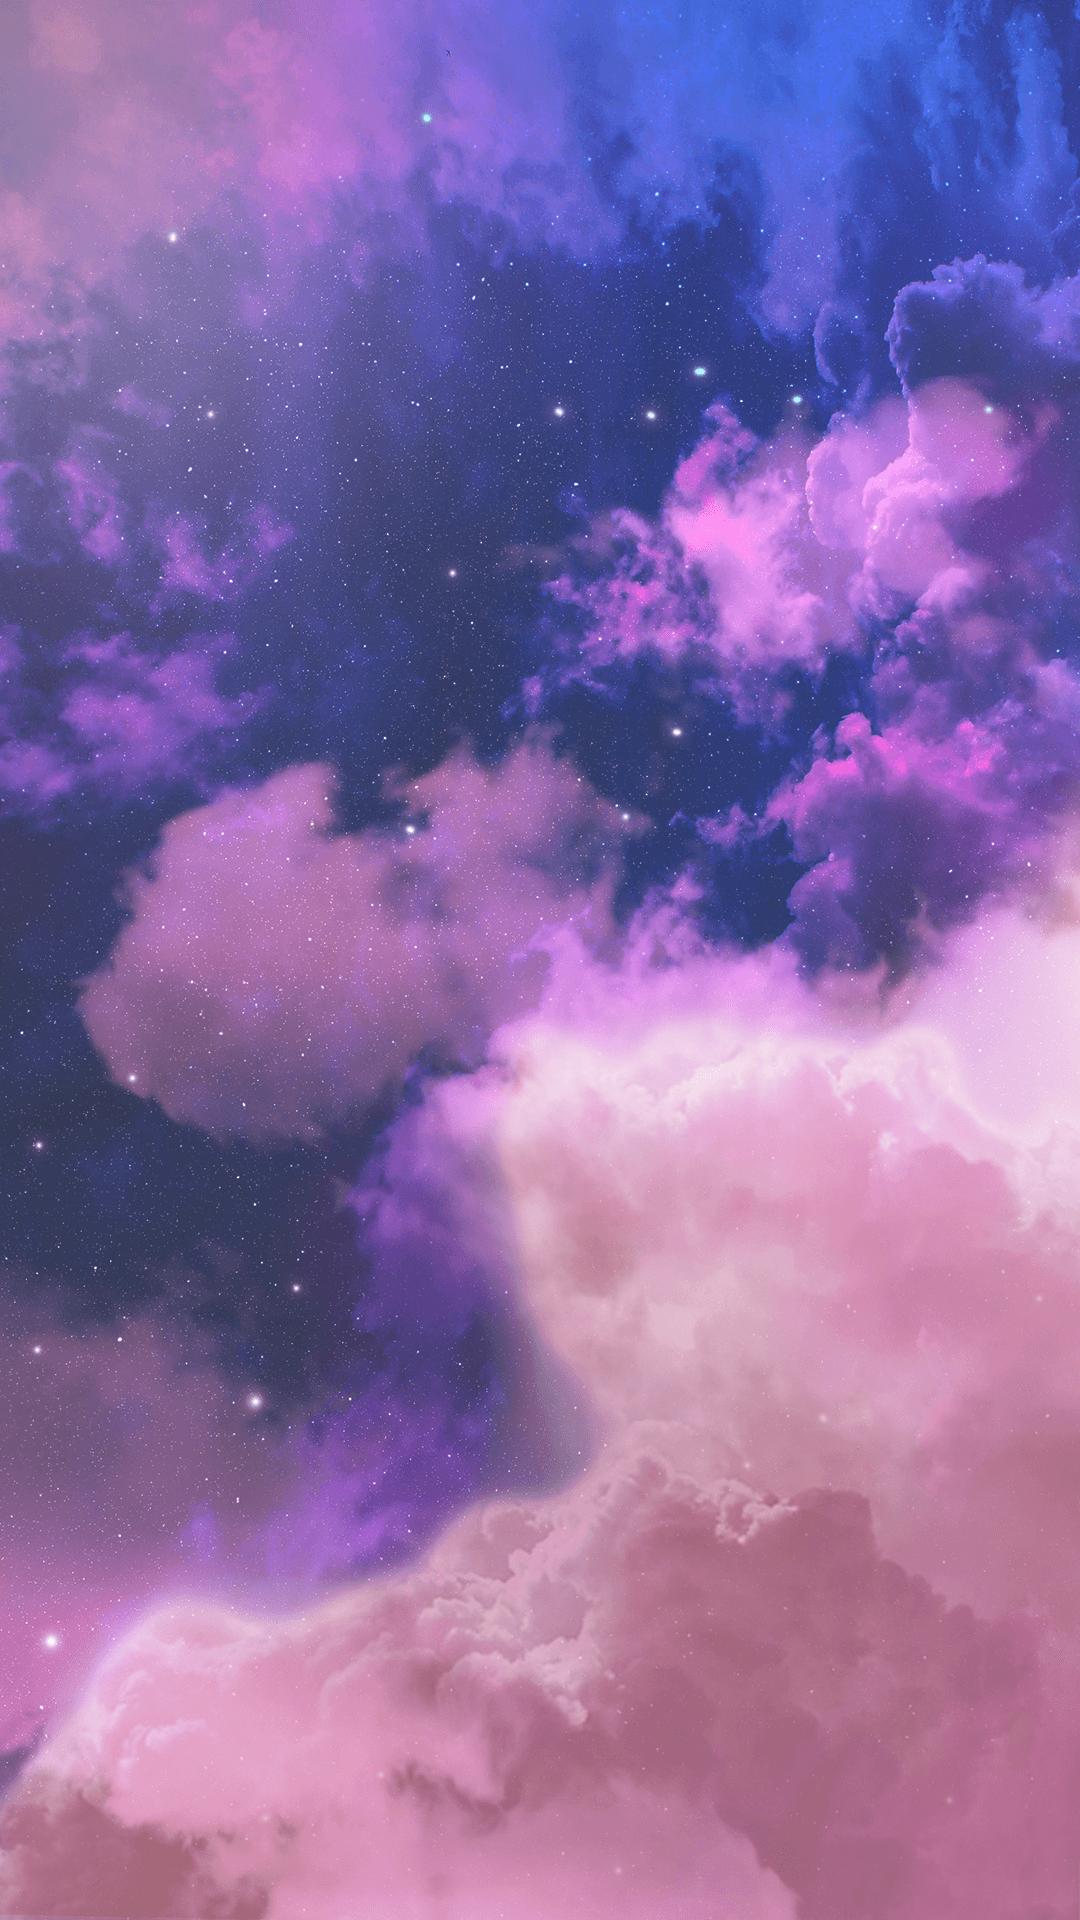 Aesthetic Purple Cloud Wallpapers Wallpaper Cave